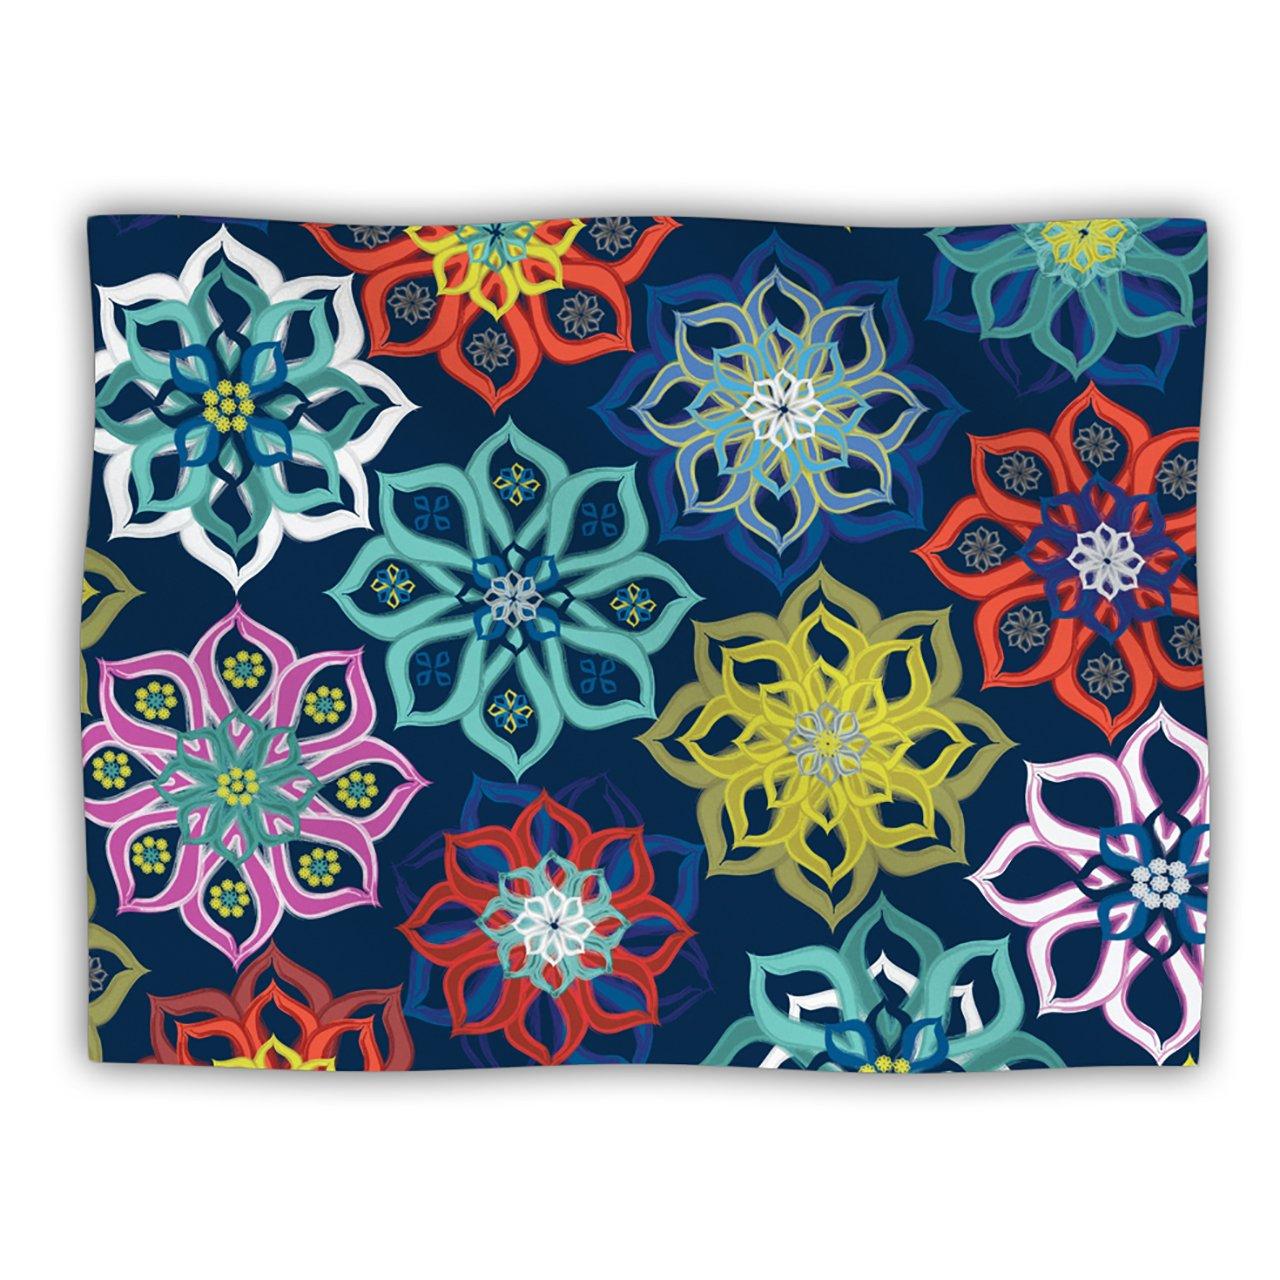 Kess InHouse Jolene Heckman  Multi Flower Rainbow Flowers  Dog Blanket, 60 by 50-Inch